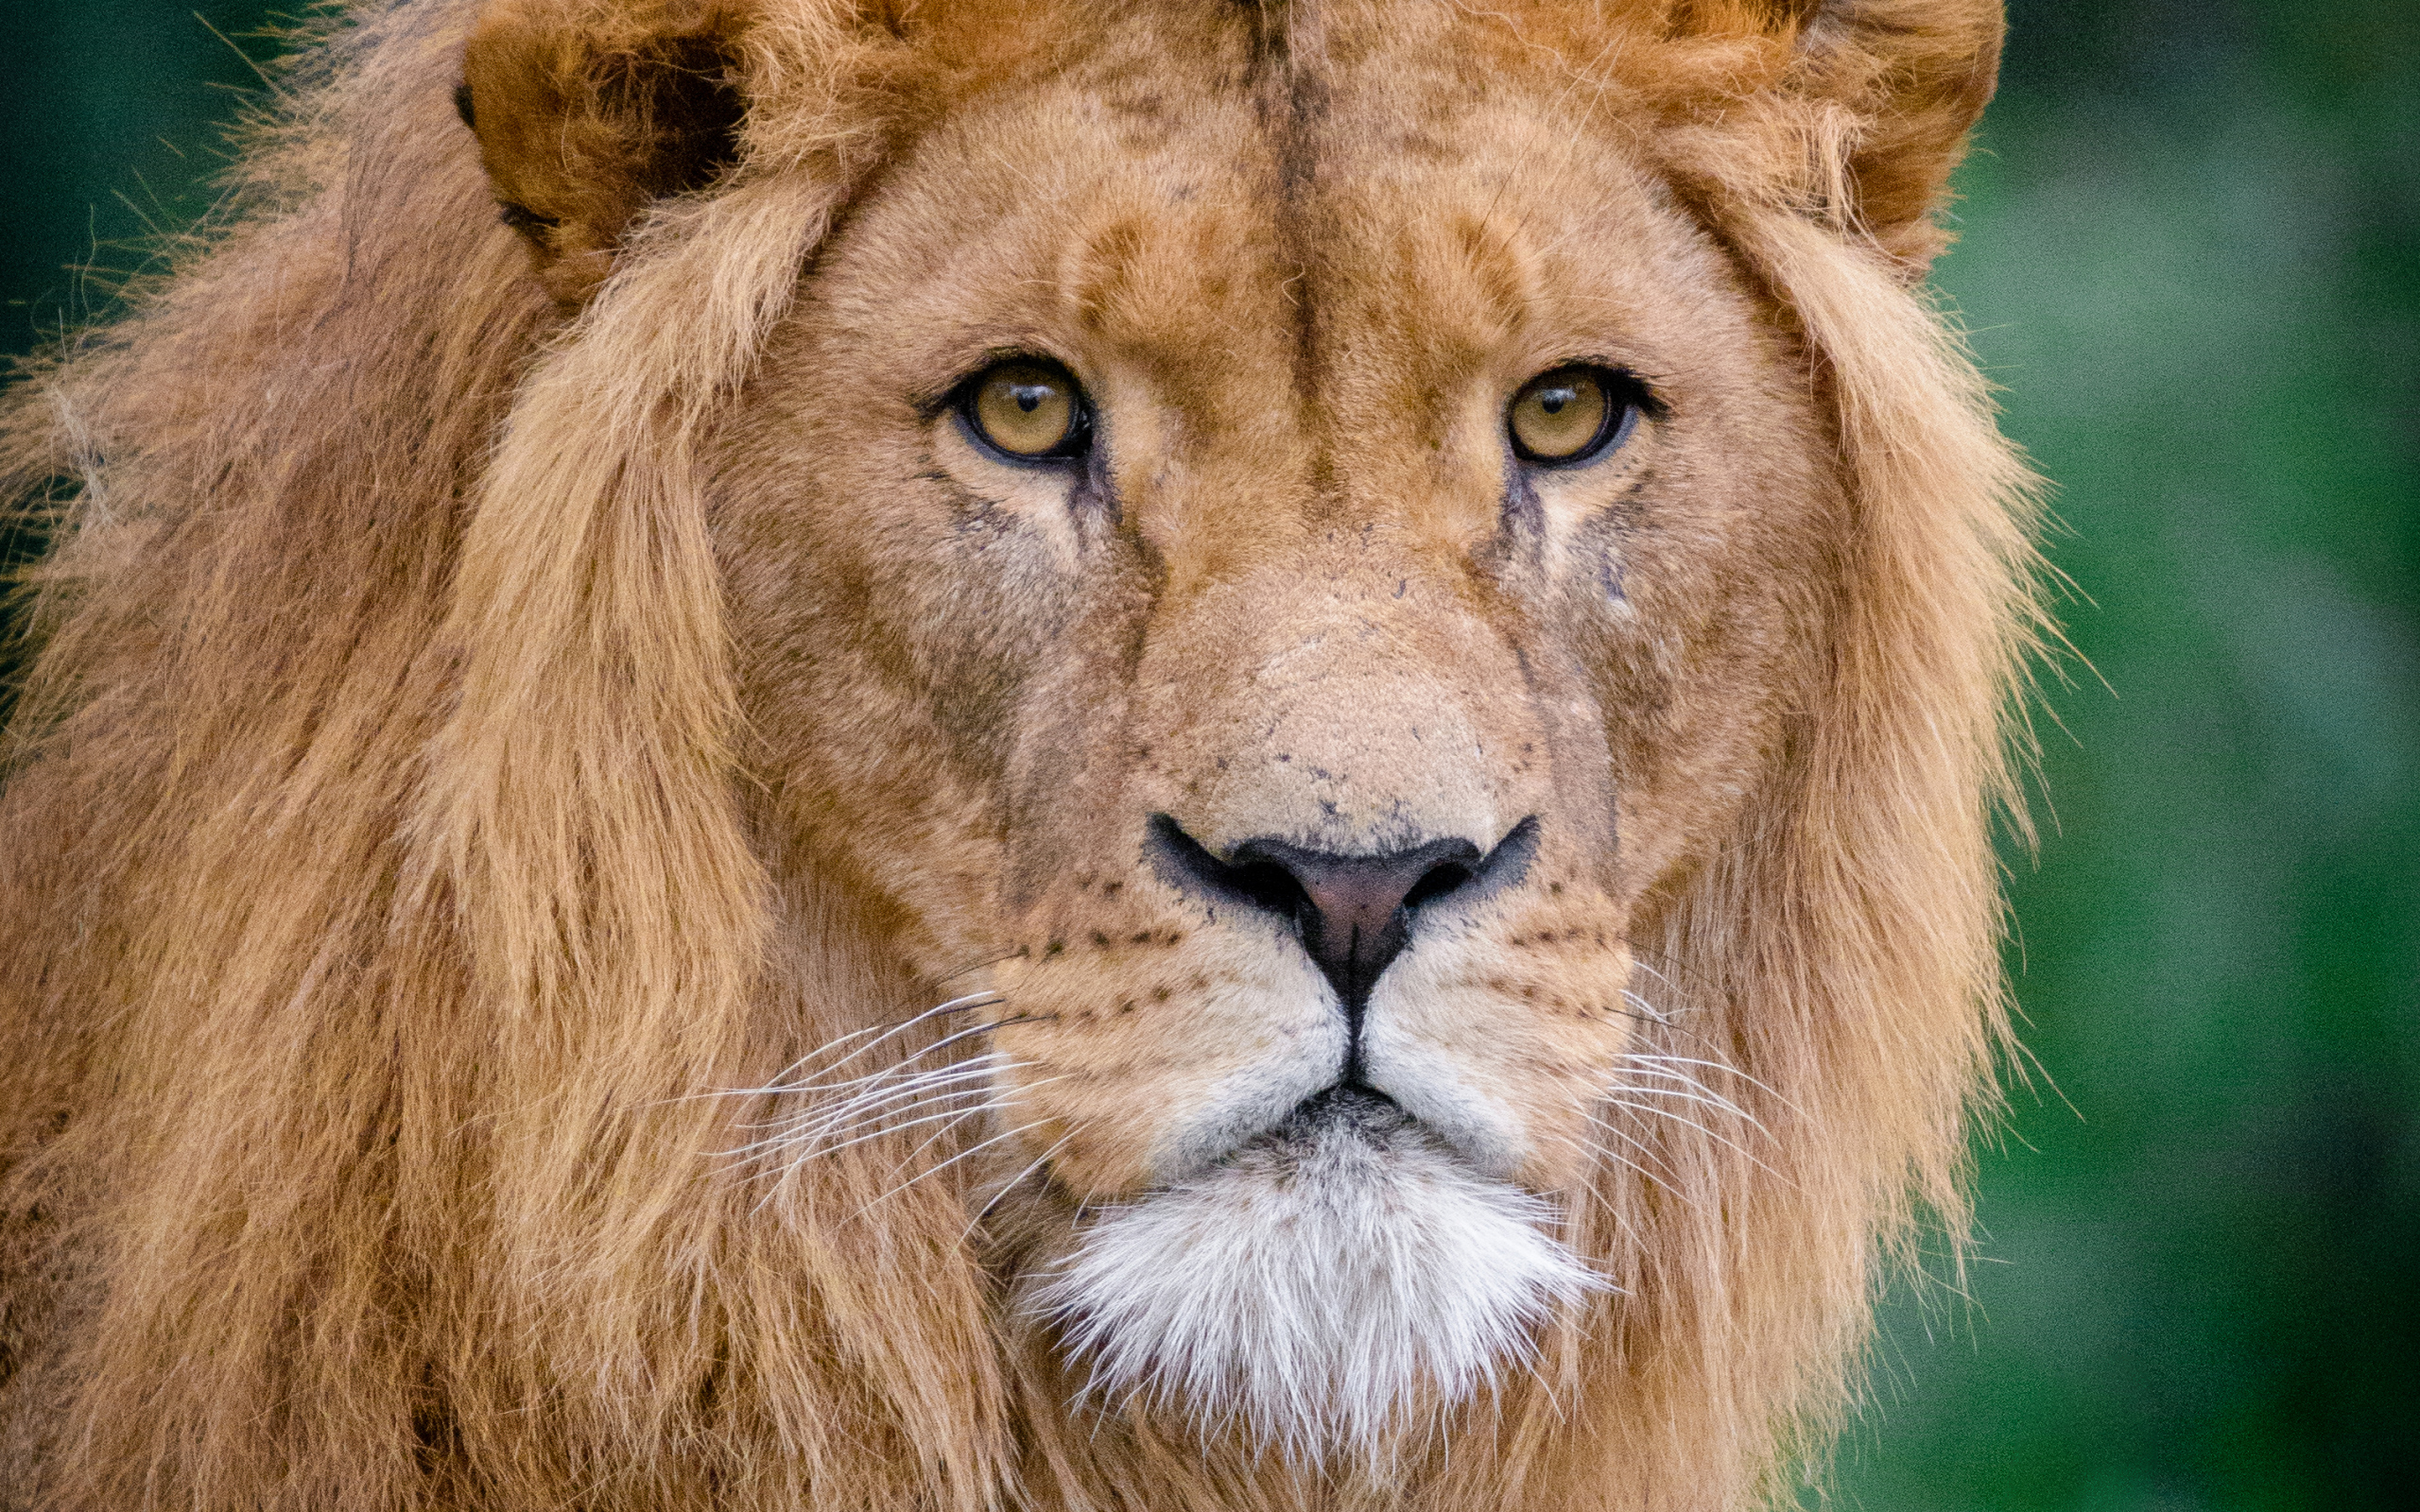 lion-muzzle-predators-king-of-beasts-wildlife.jpg